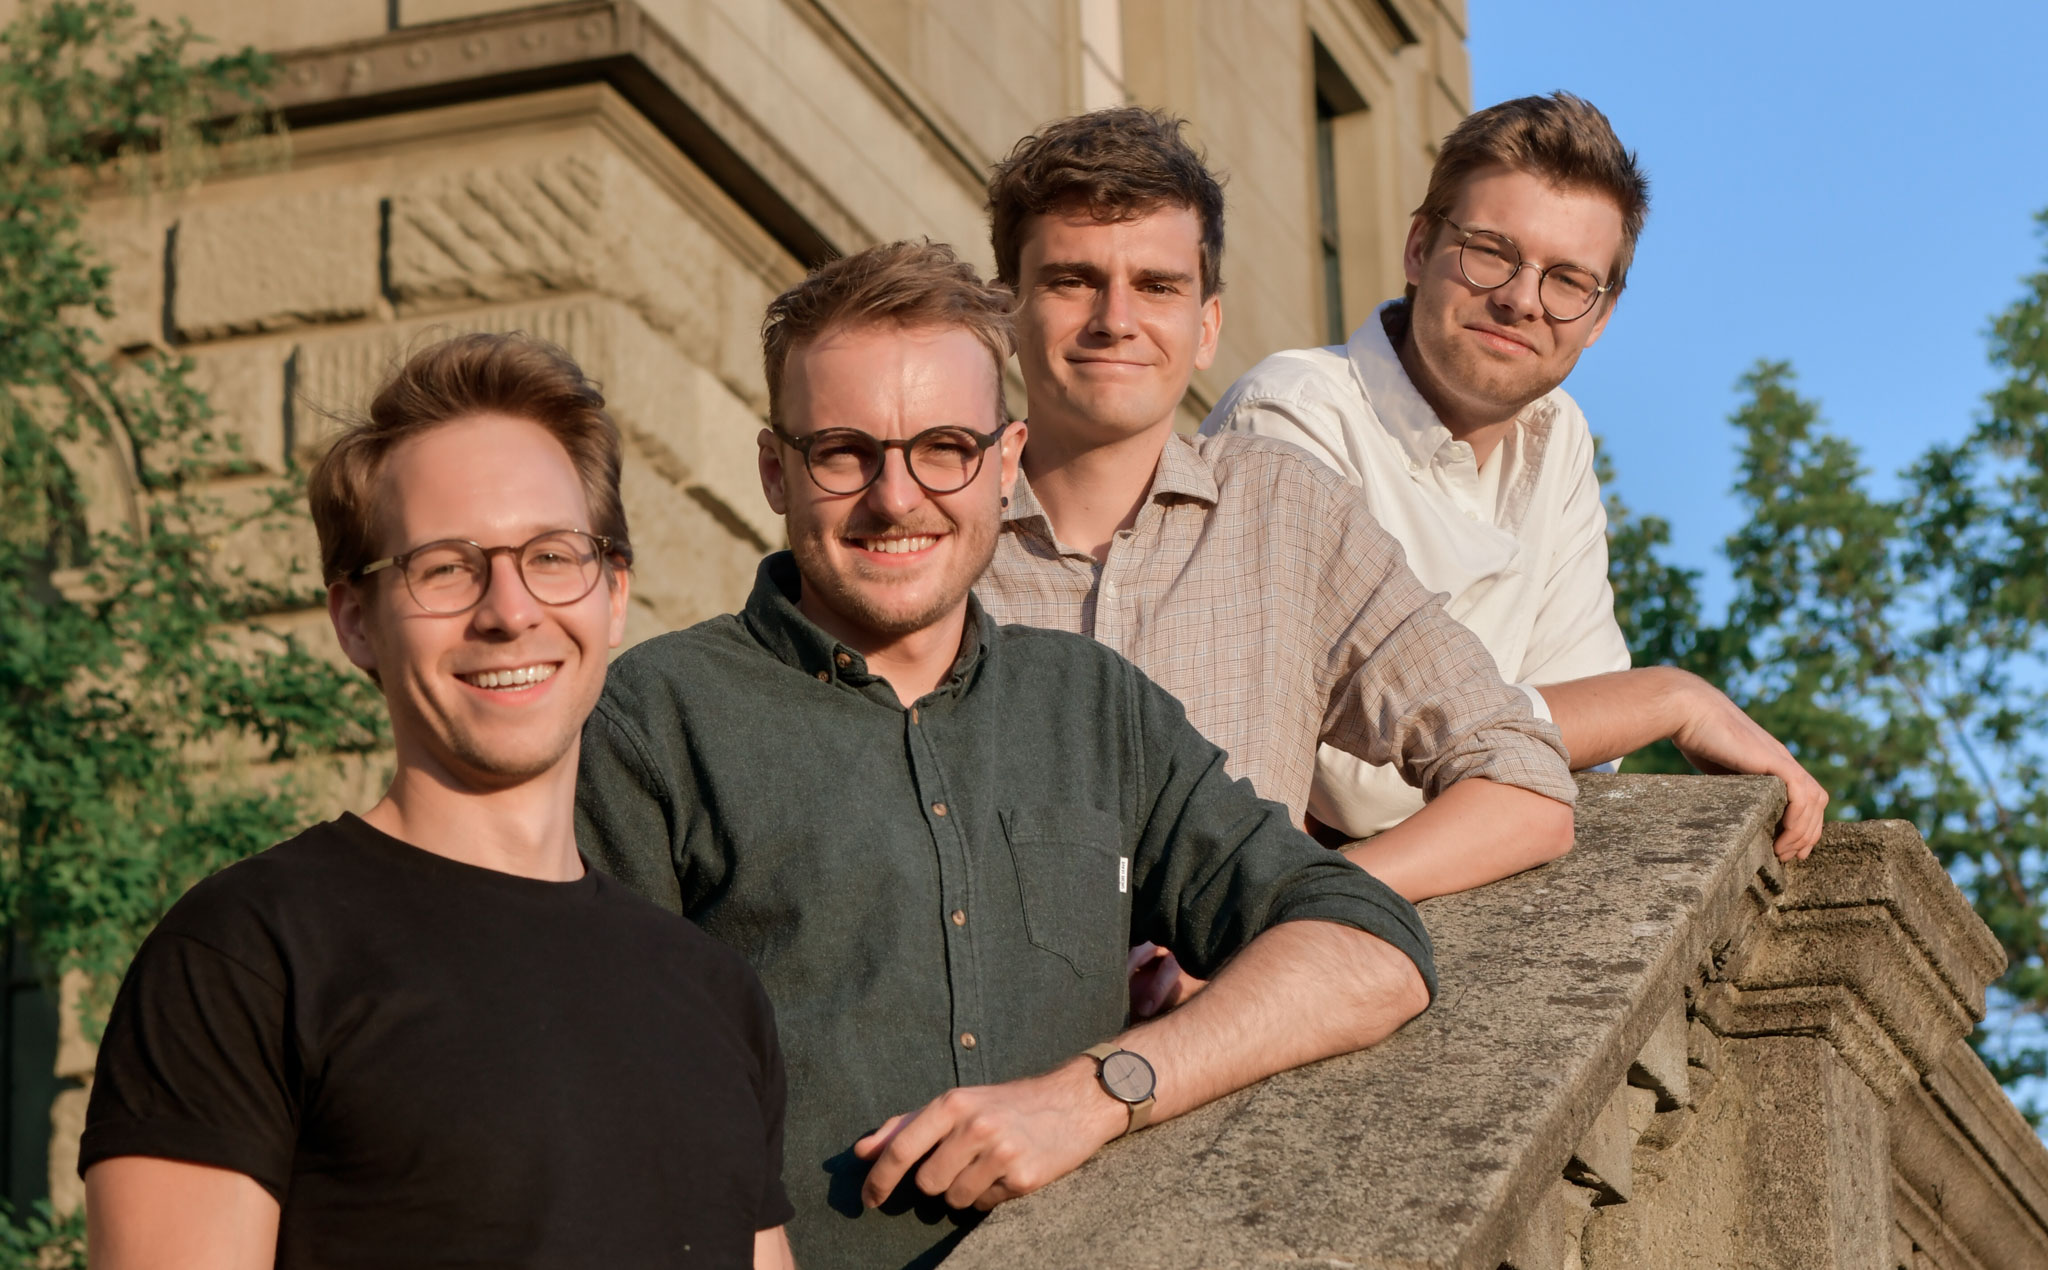 From left: Kevin Anschau Schwarzer, Tobias Stegemann, Joel Bachmann, Carl Biagosch. The Founding Team of the Computer Vision Startup Mantis Technologies at ETH Zurich.